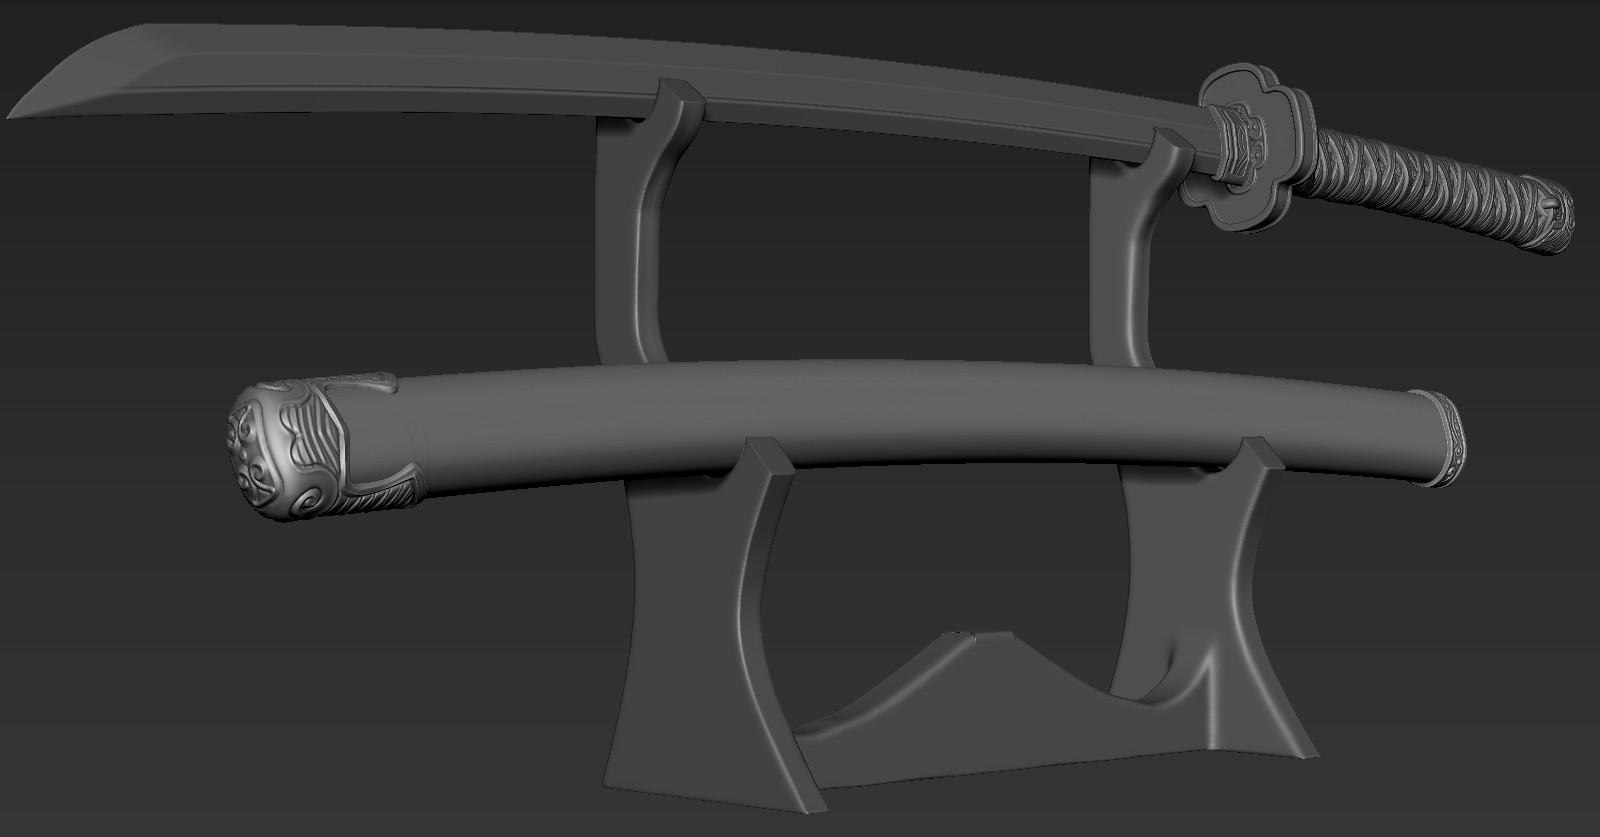 ZBrush Document03.jpg Download free STL file katana 01 • 3D printable template, Dynastinae